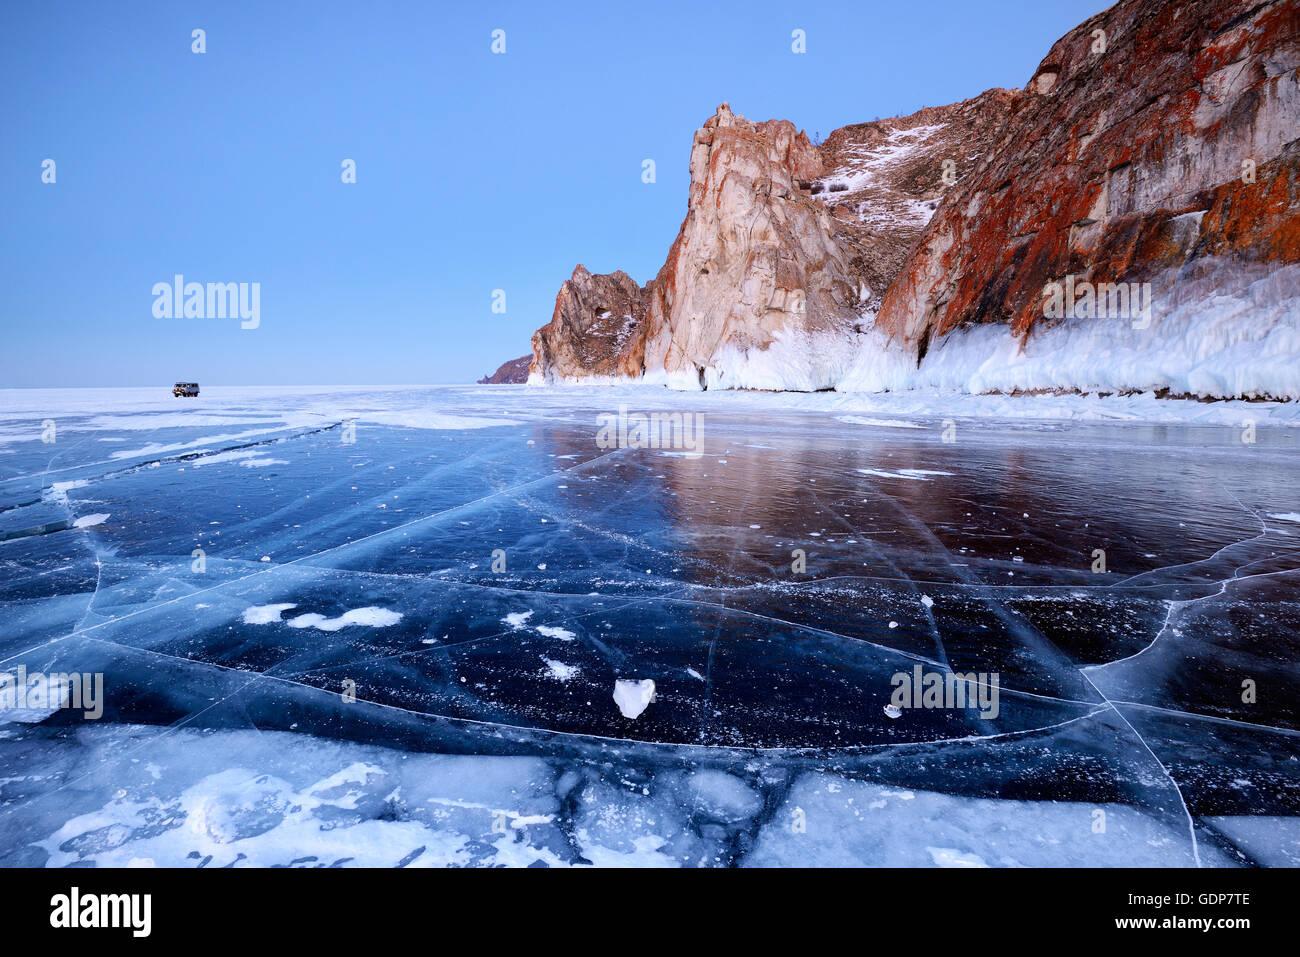 Cape Sagan Khushun and Three Brothers Rock, Baikal Lake, Olkhon Island, Siberia, Russia - Stock Image